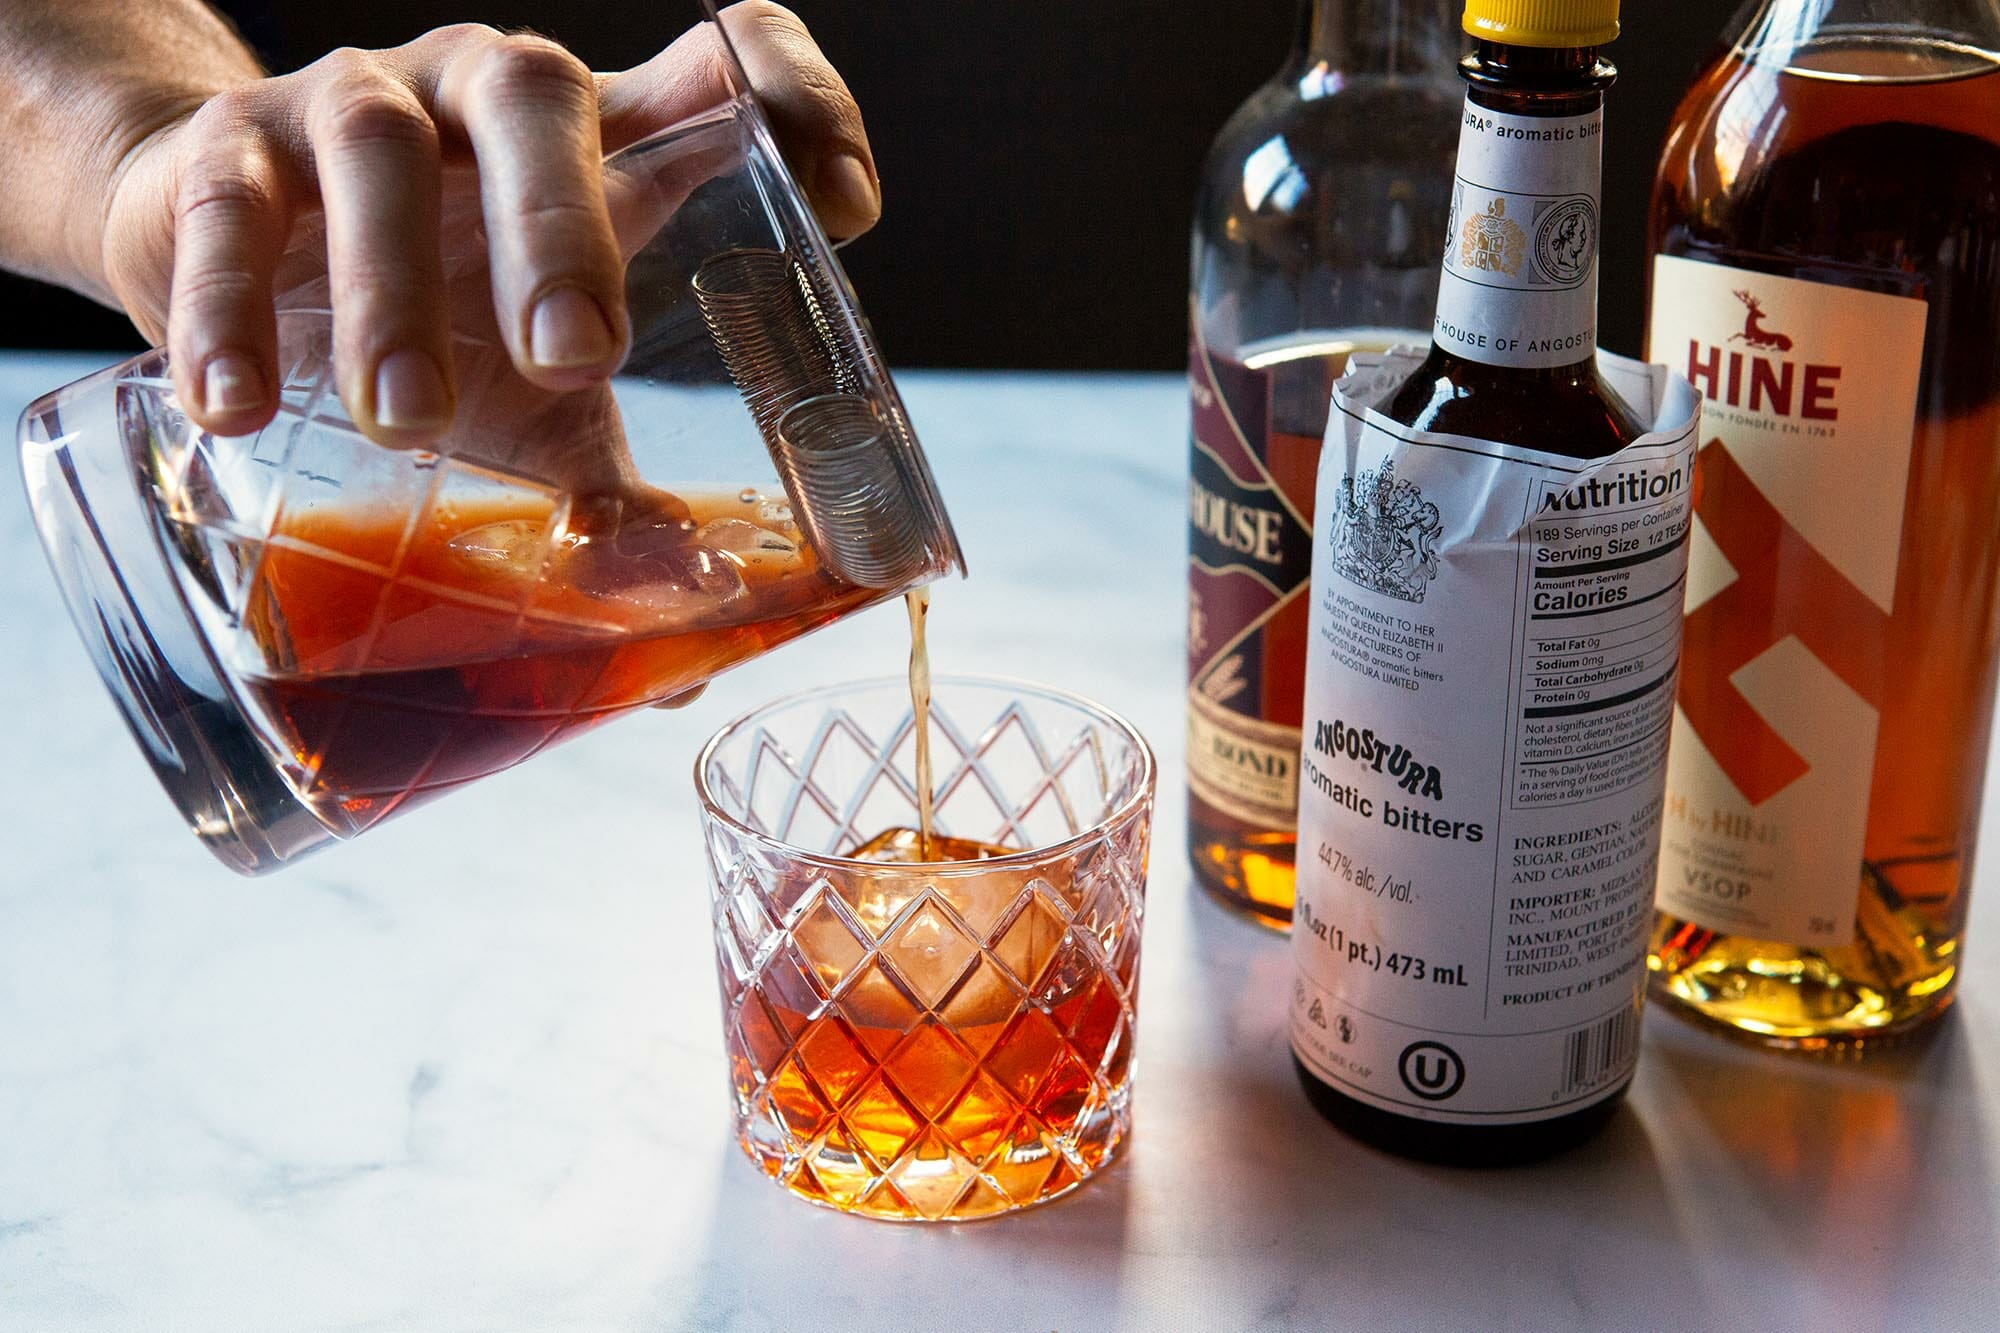 Vieux carre процеживают в бокал для виски. Бутылки для коктейля - справа.